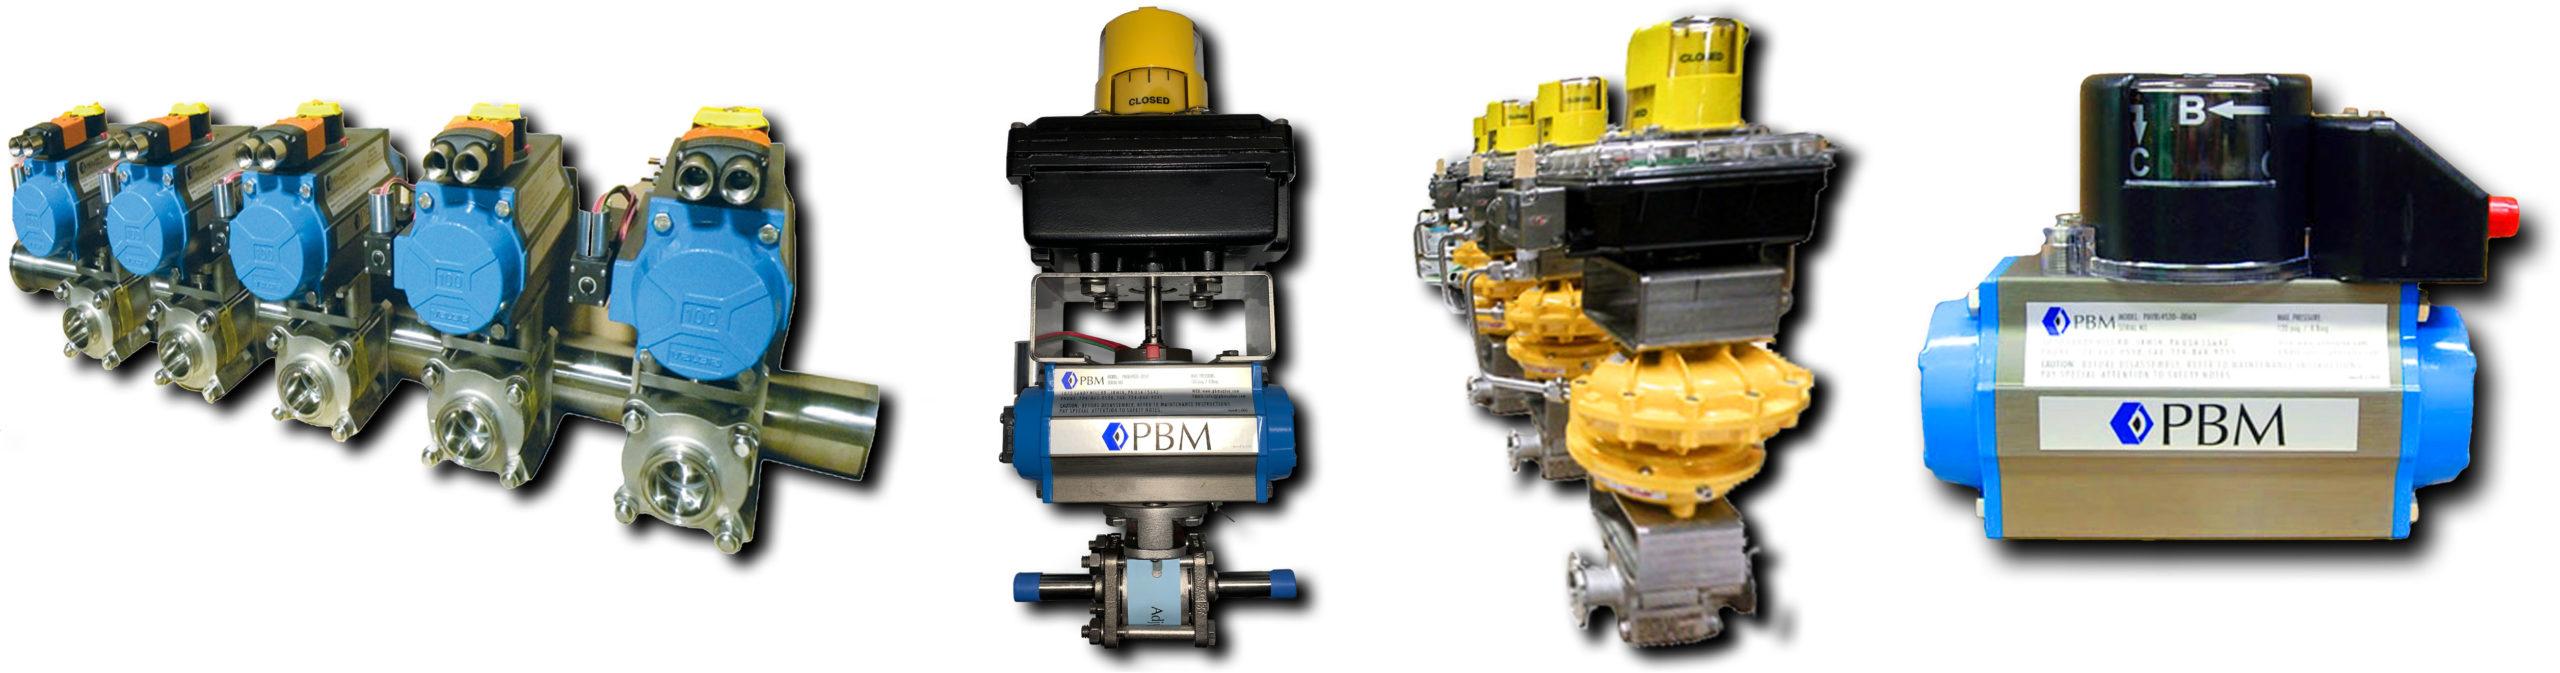 PBM Controls